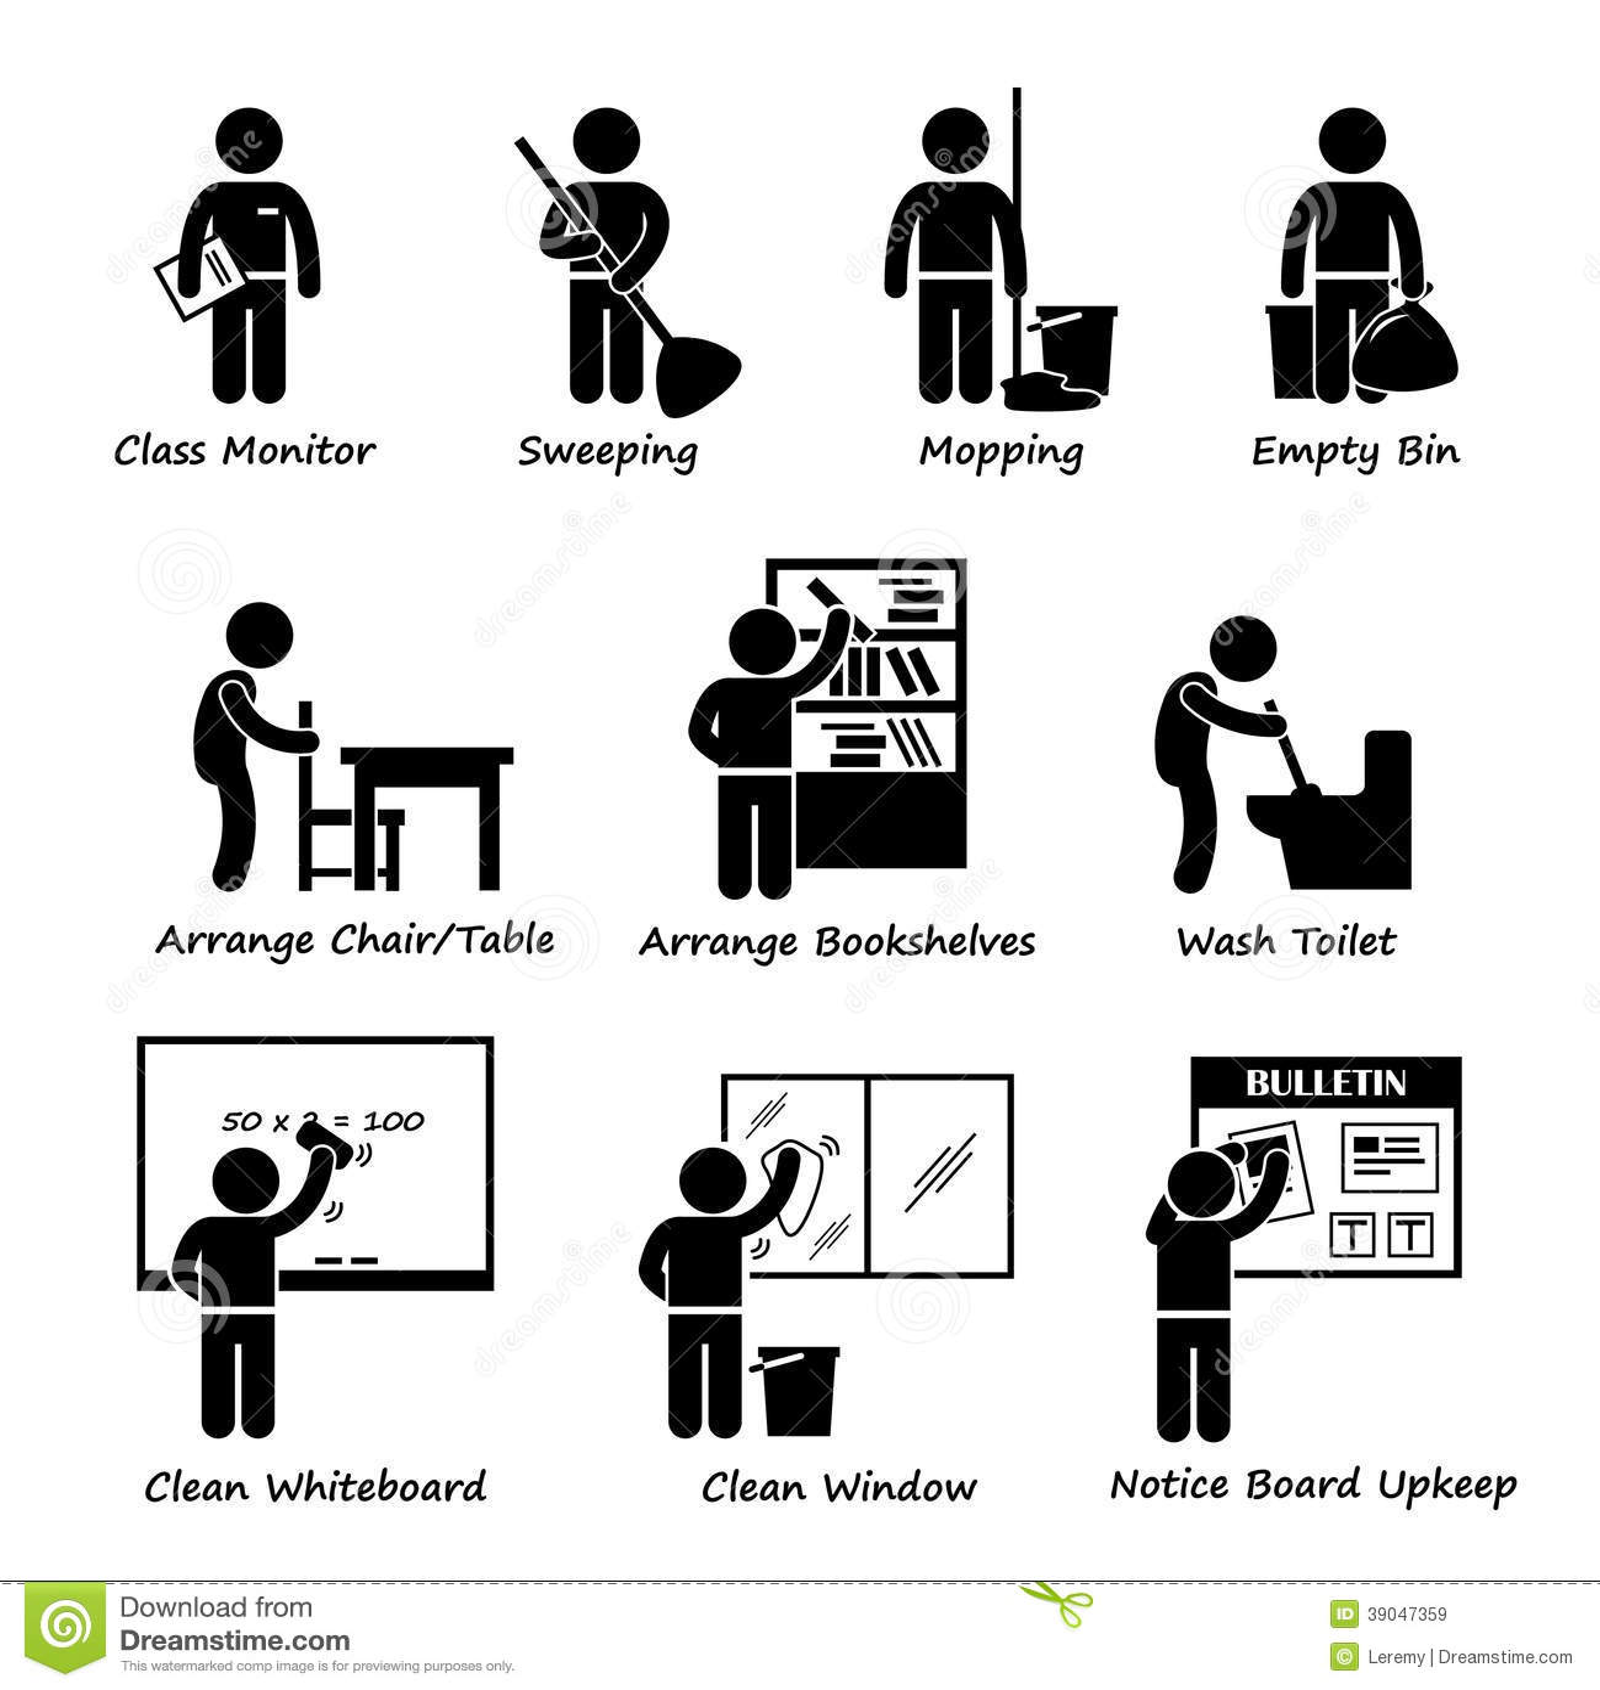 Klassenzimmer Student Duty Roster Clipart Vektor Abbildung